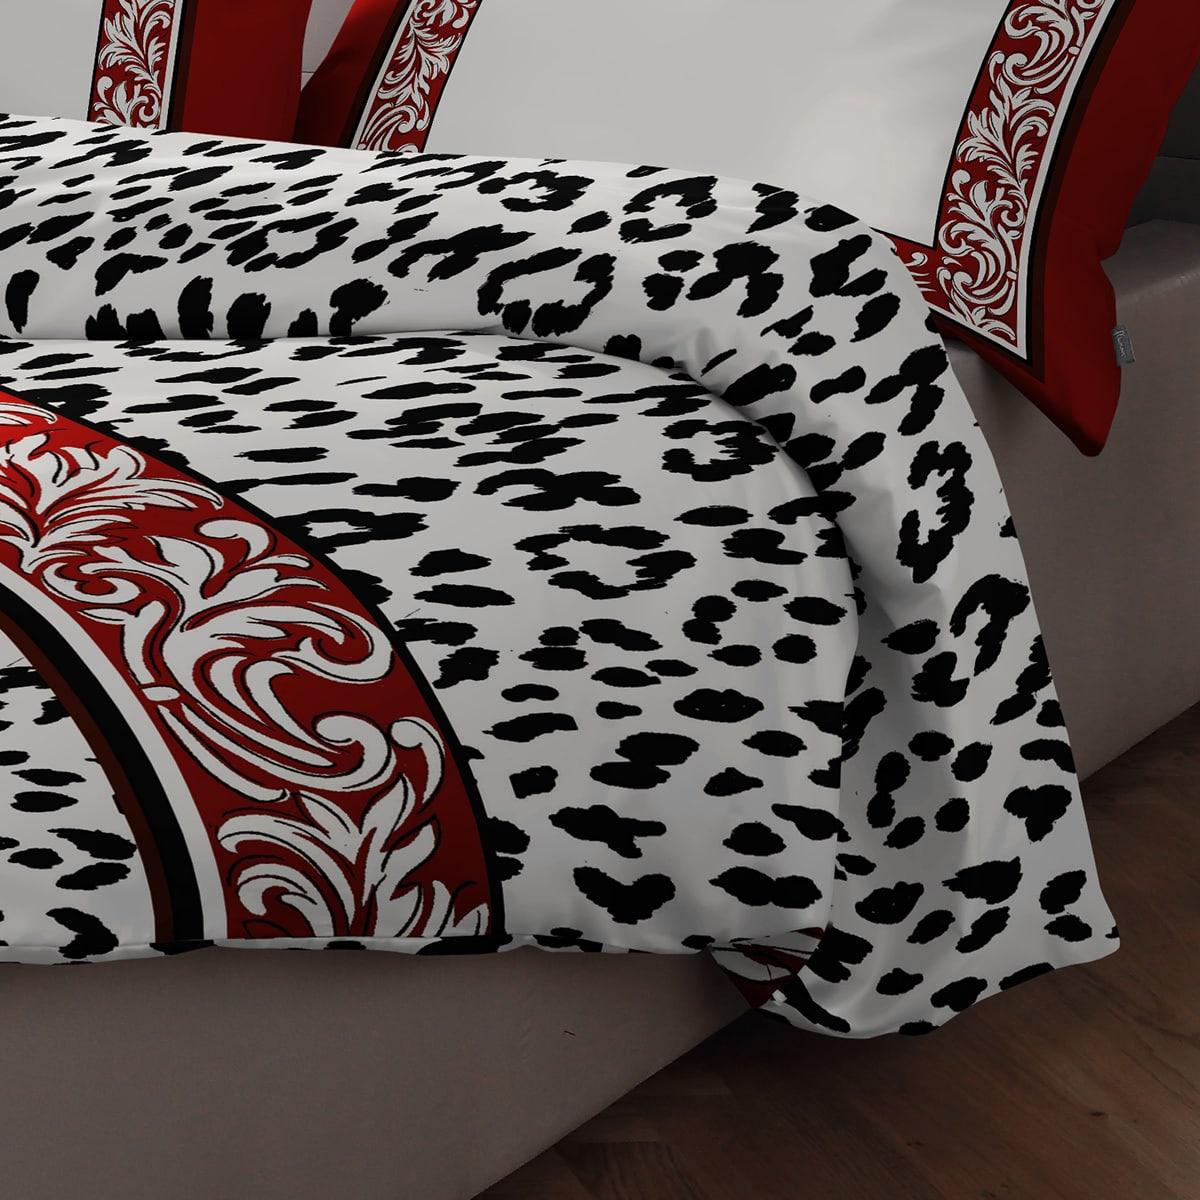 fleuresse feinbiber bettw sche leo g nstig online kaufen bei bettwaren shop. Black Bedroom Furniture Sets. Home Design Ideas